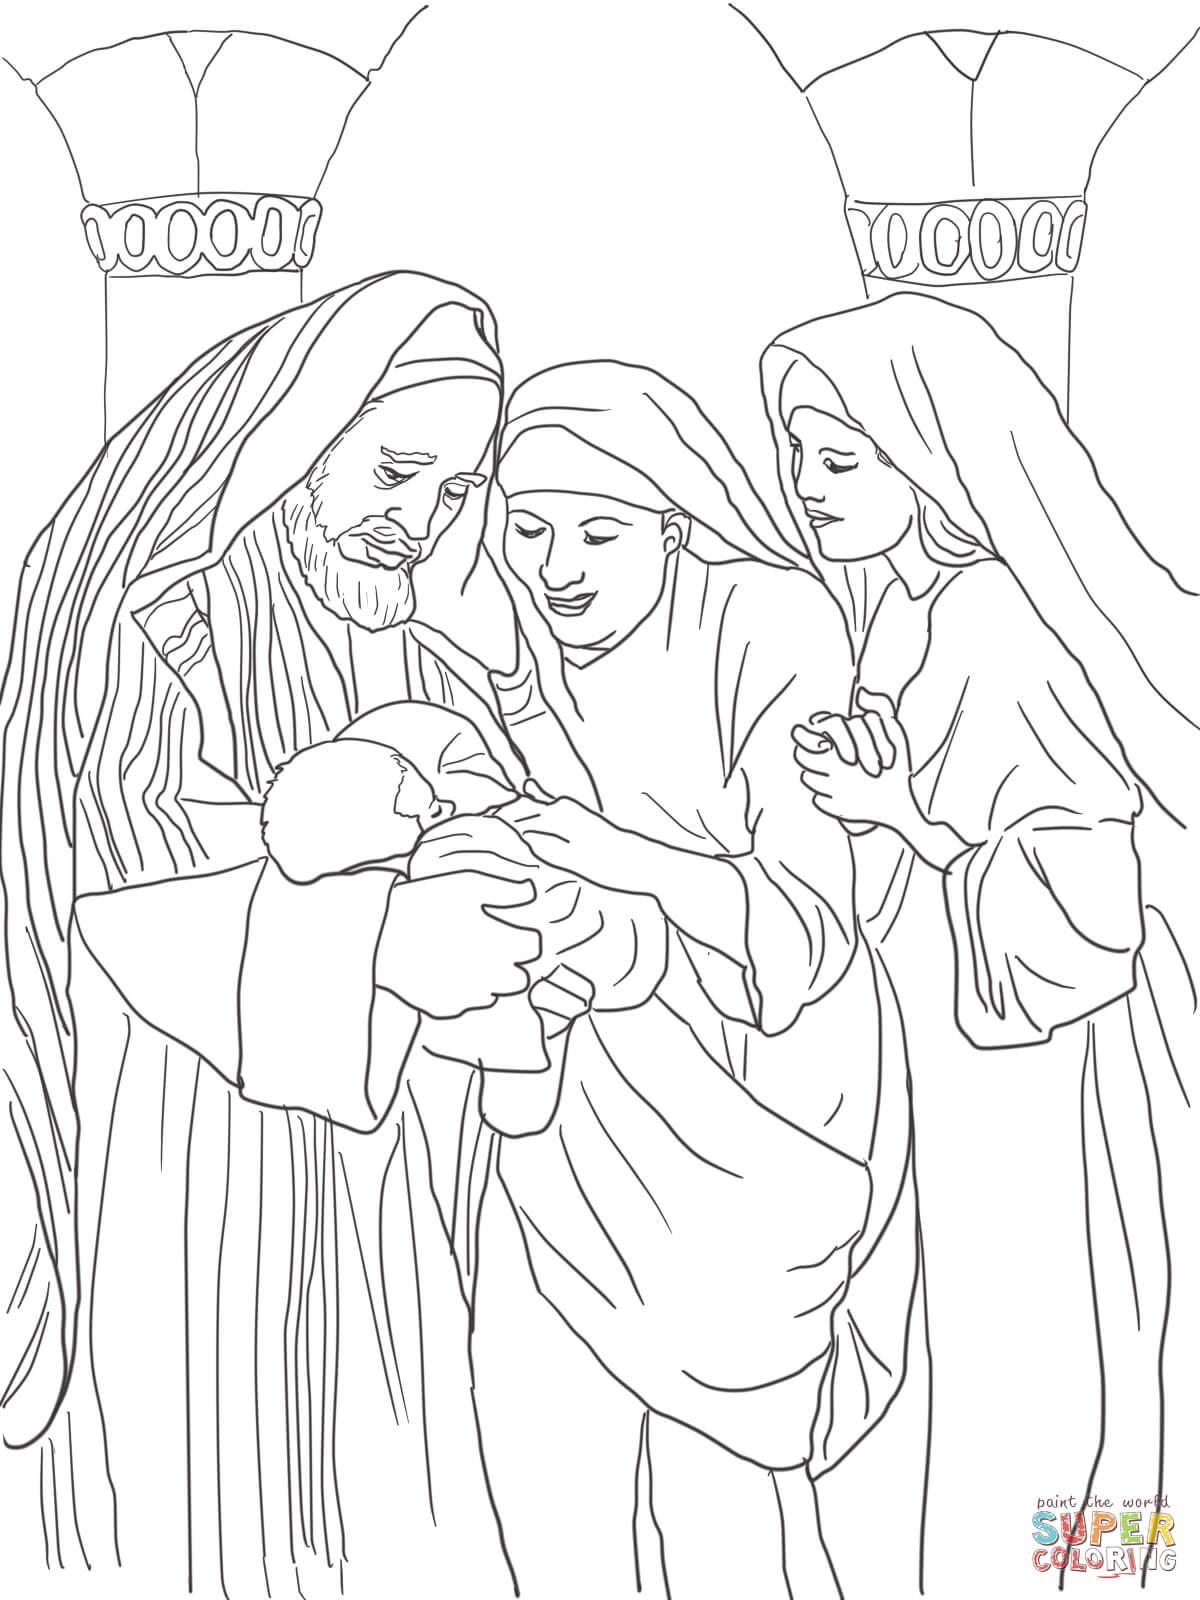 1-zechariah-elizabeth-and-baby-john-the-baptist-coloring